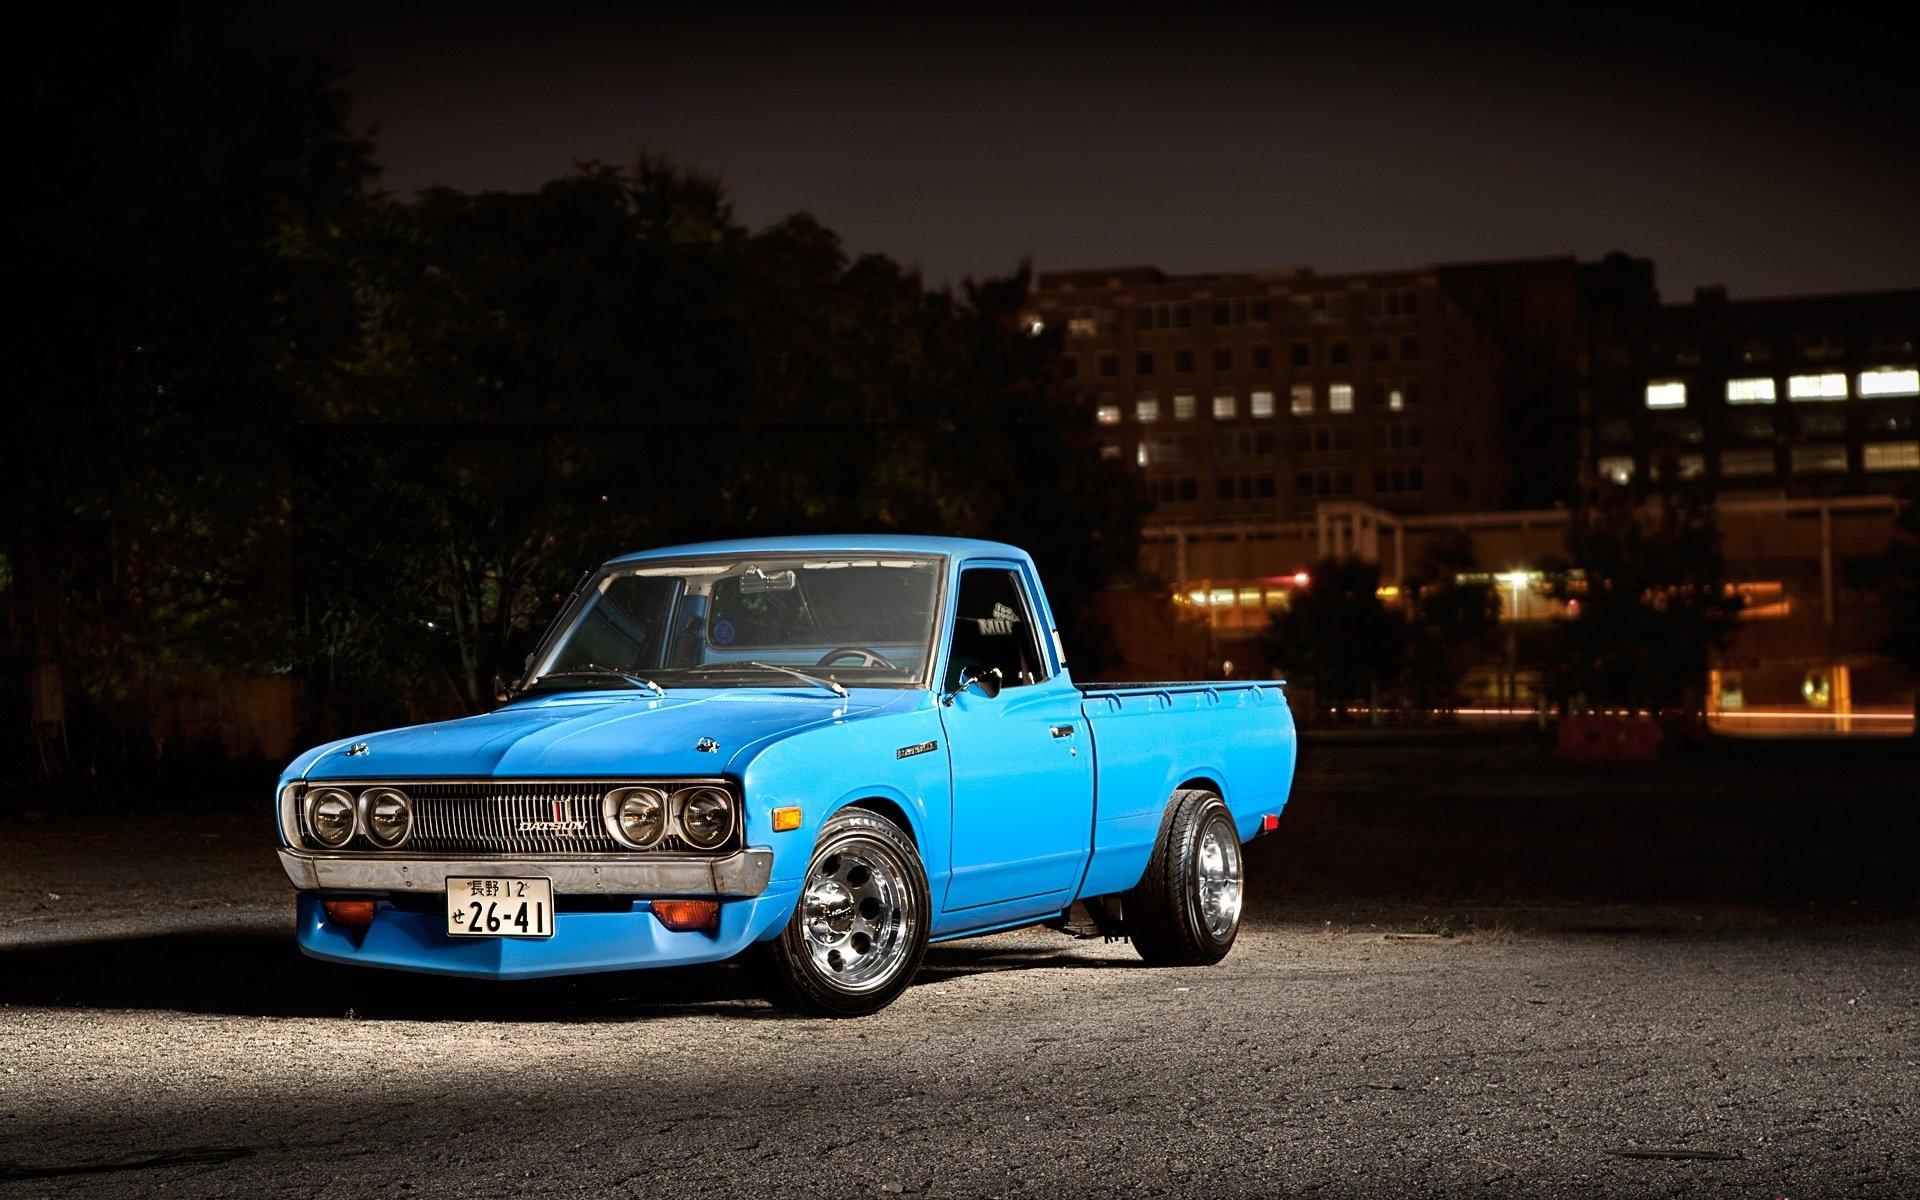 1974 Datsun 620 Hd Wallpaper